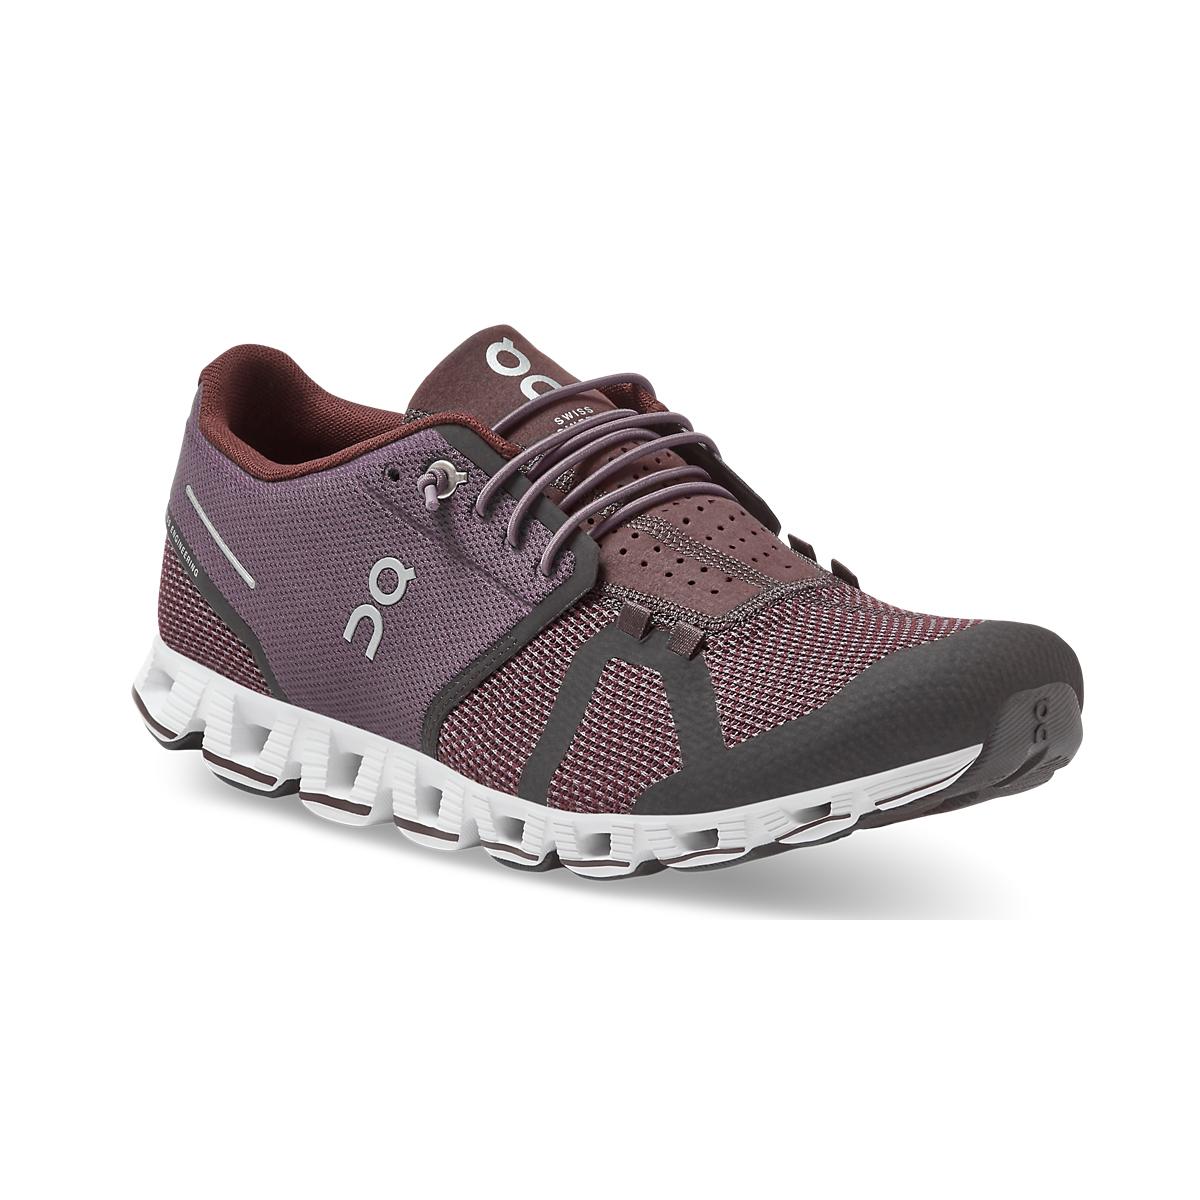 Men's On Cloud Running Shoe - Color: Pebble/Raisin - Size: 7.5 - Width: Regular, Pebble/Raisin, large, image 4